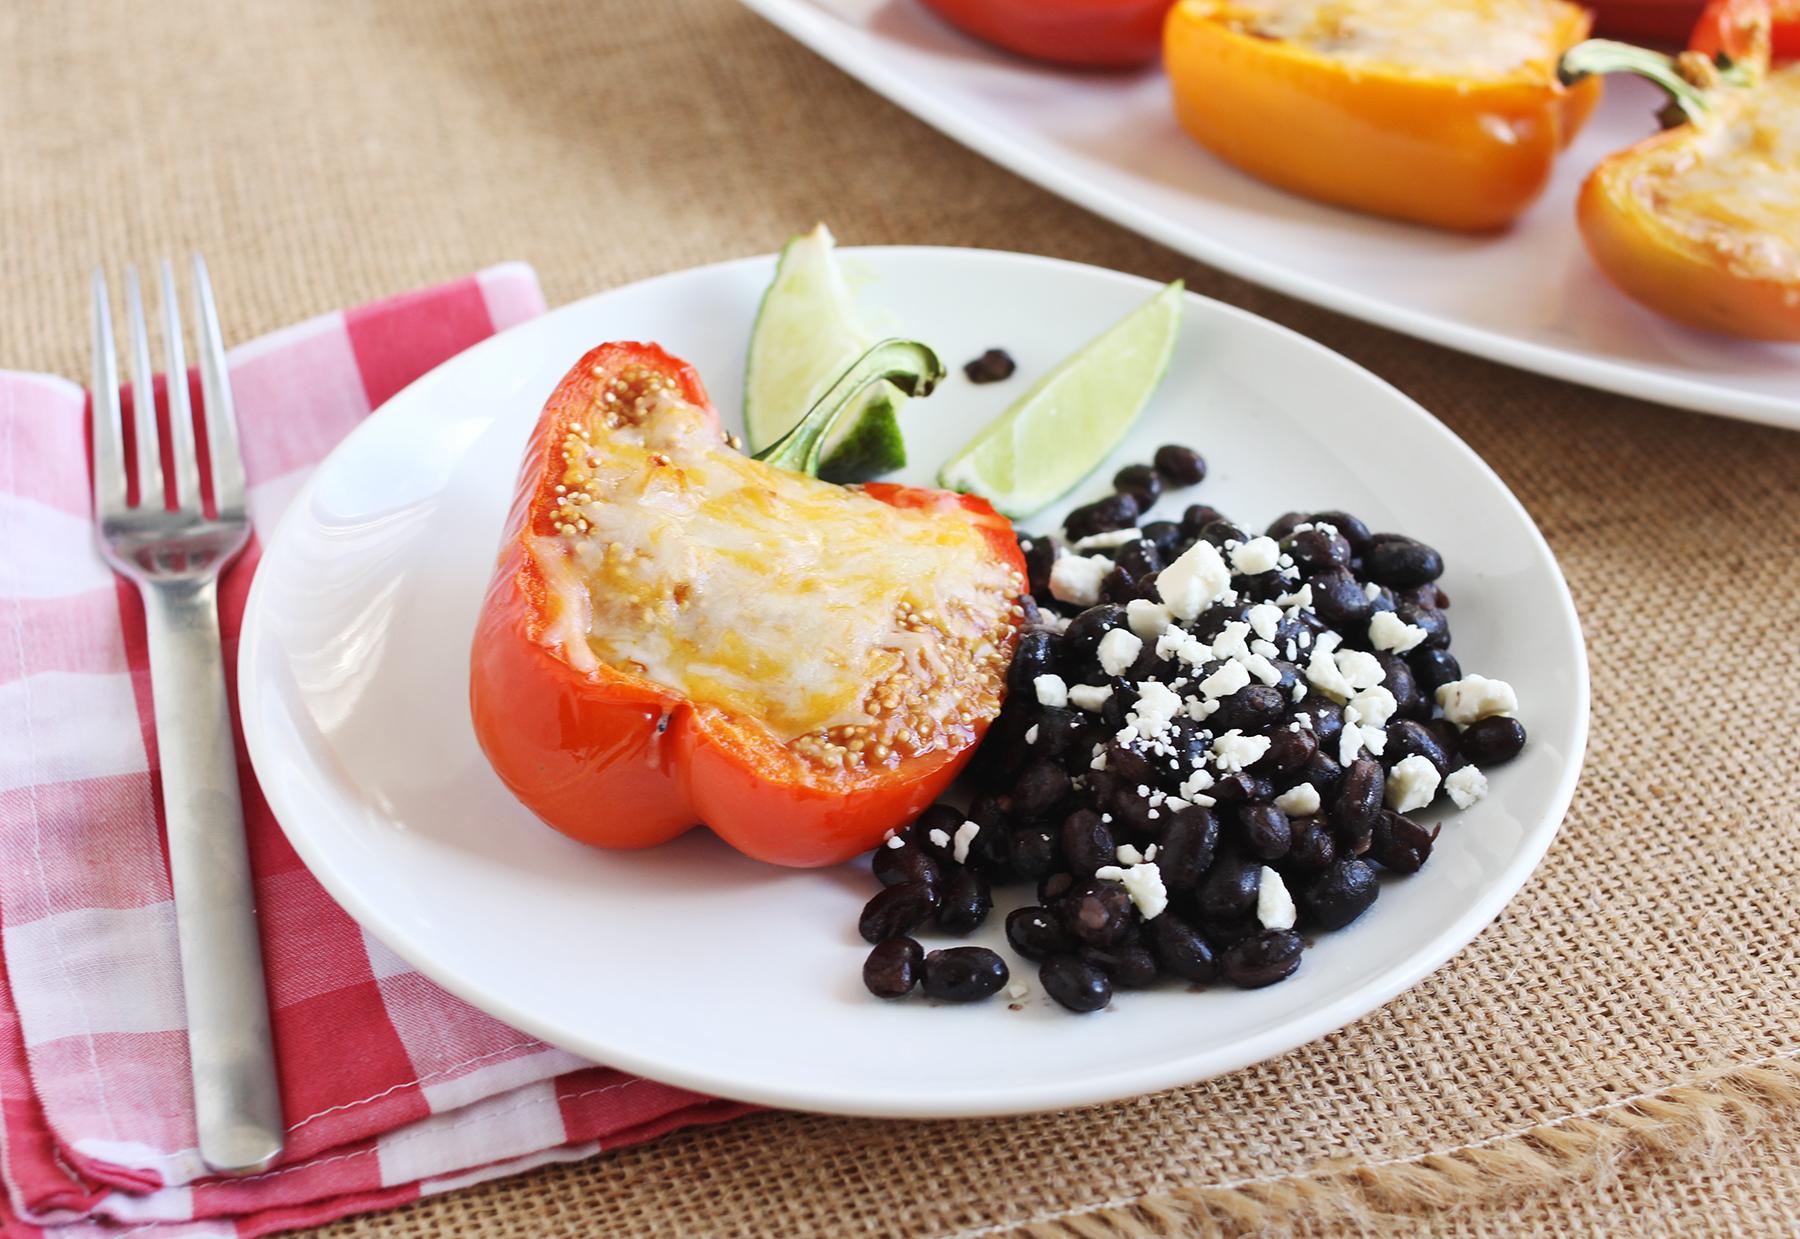 My favorite quinoa stuffed bell peppers